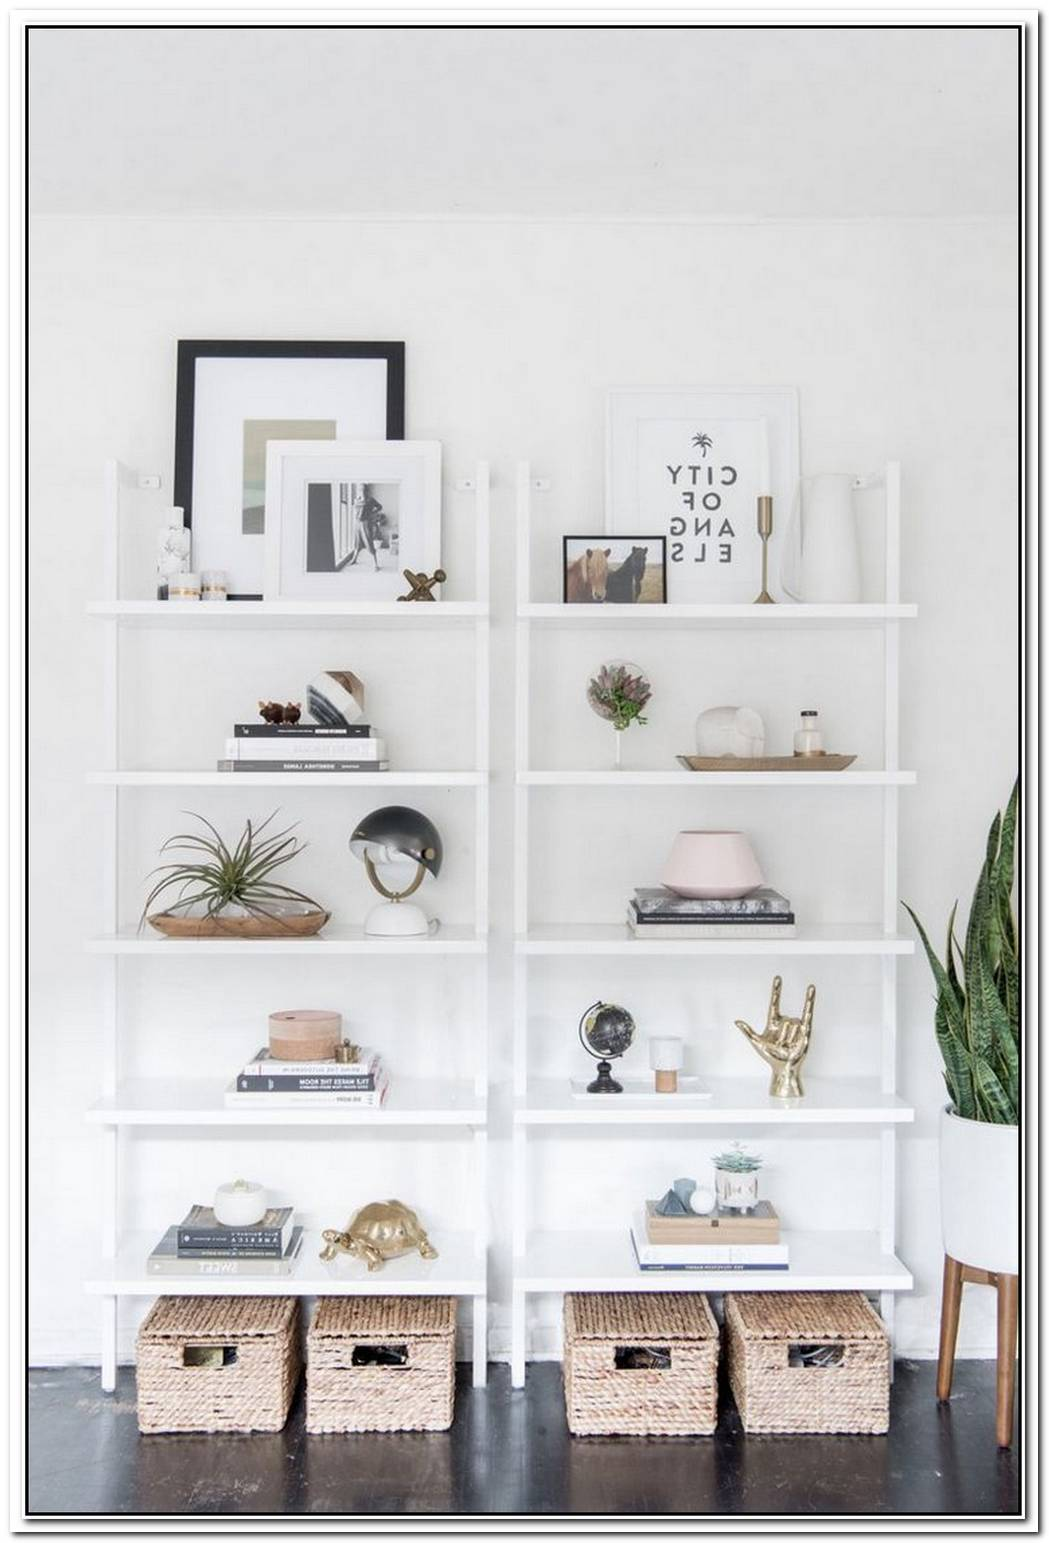 Classic Tradition Into A Contemporary Wall Shelf